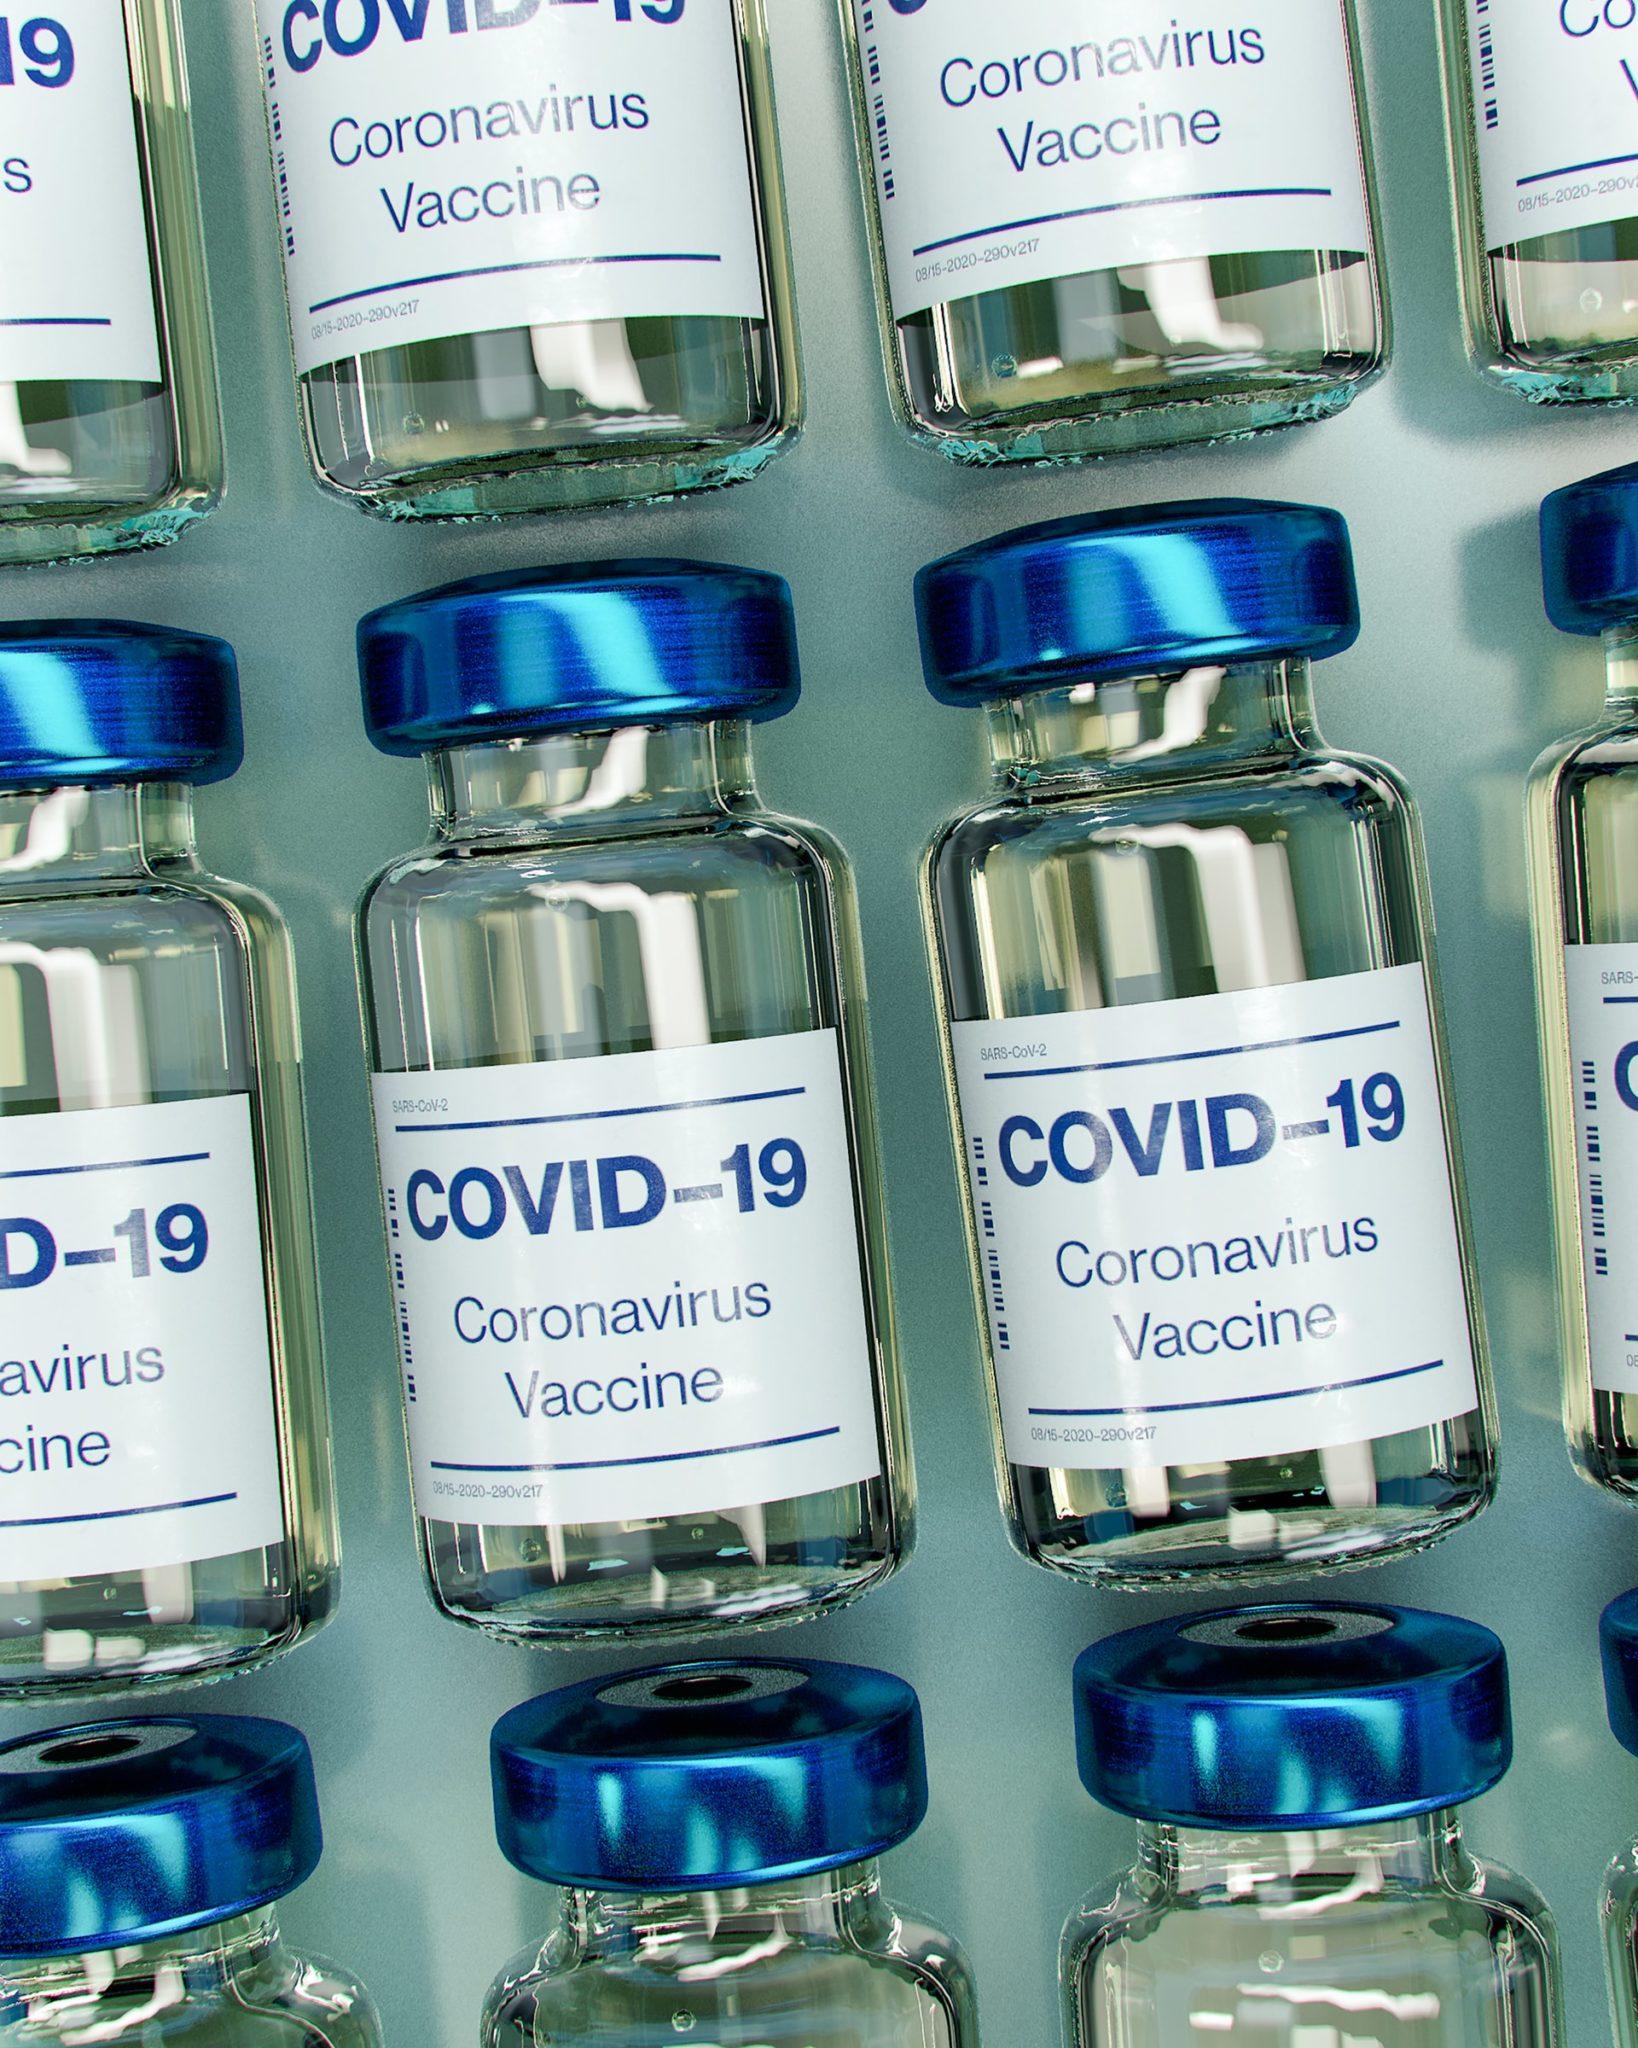 Vacuna COVID19 unsplash scaled - COVID La vacuna